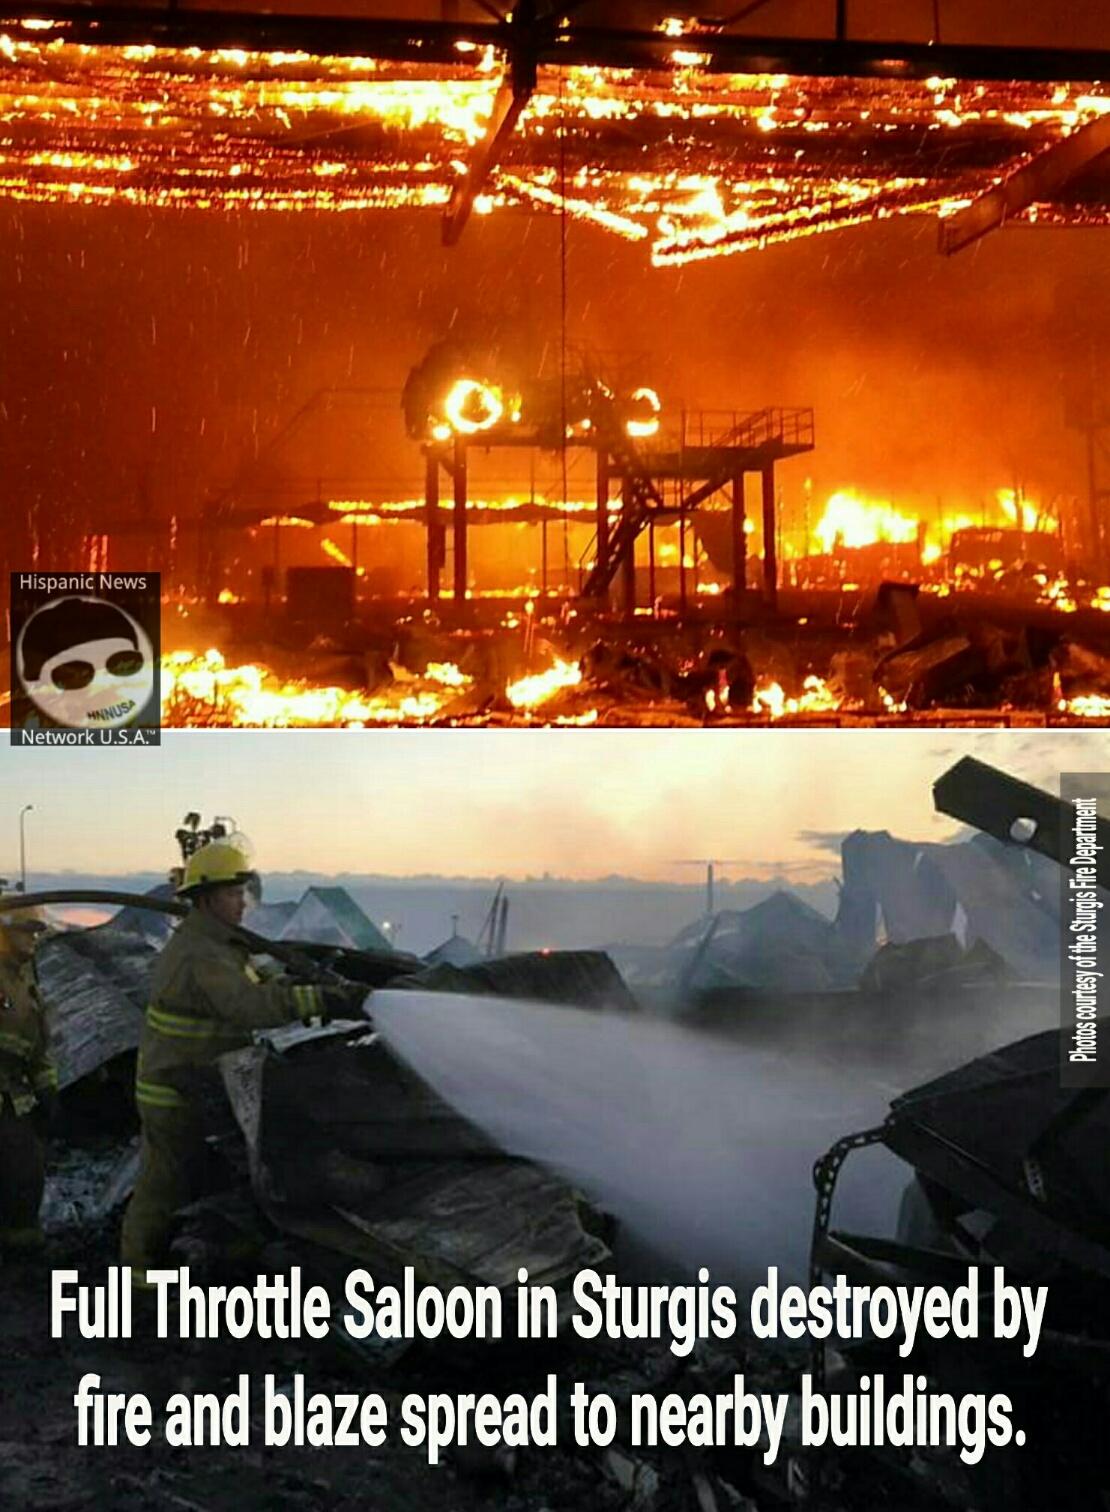 Hispanic News Network U.S.A.: Full Throttle Saloon In ...